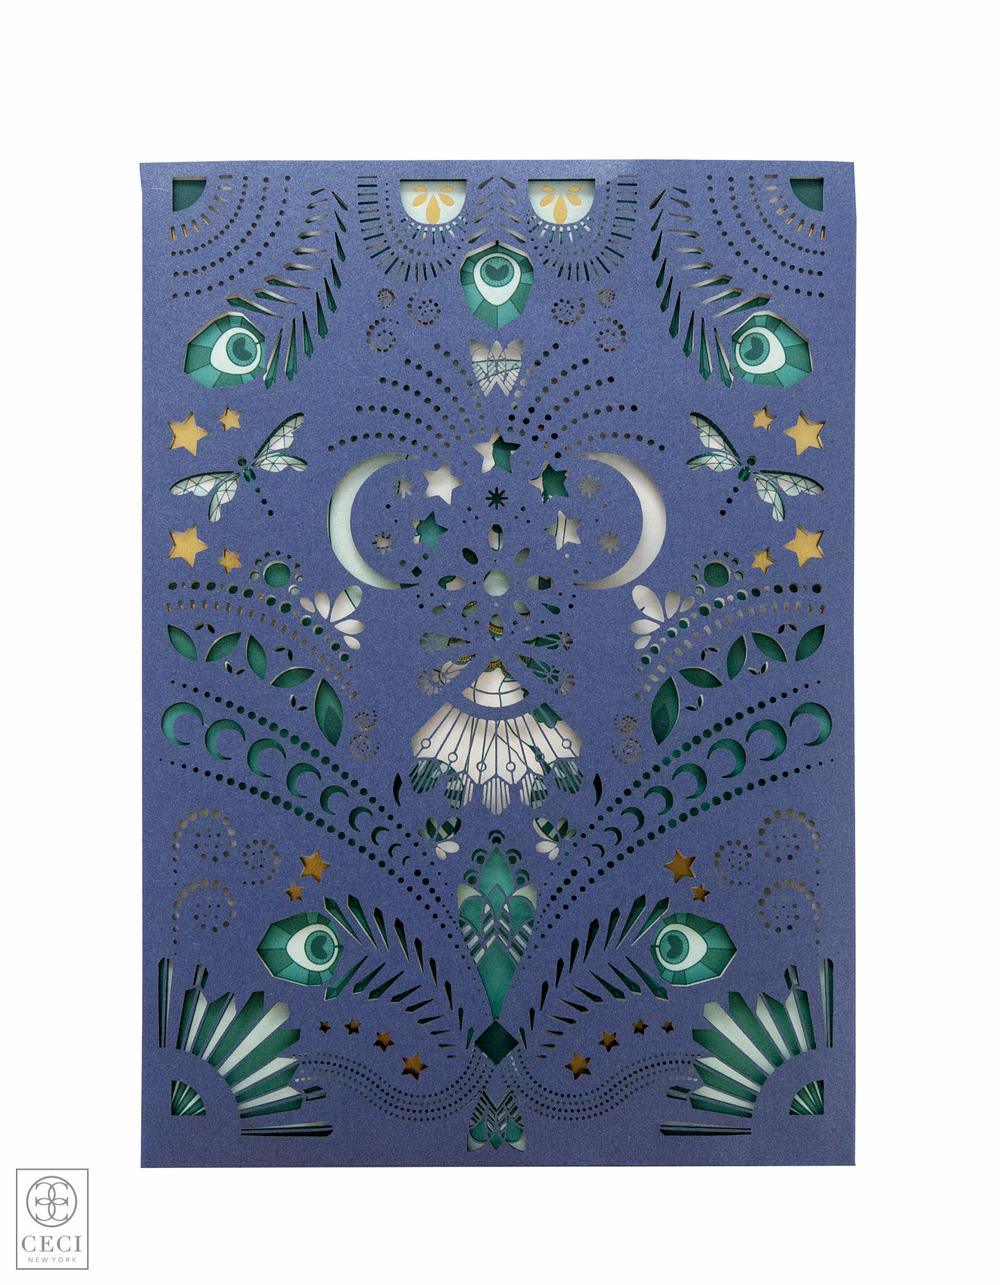 ceci_new_york_kids_party_luxury_invitation_blue_turquoise_teal_bar_bat_mitzvah_deco_illustration_four_seasons_new_york_city_nyc-3.jpg